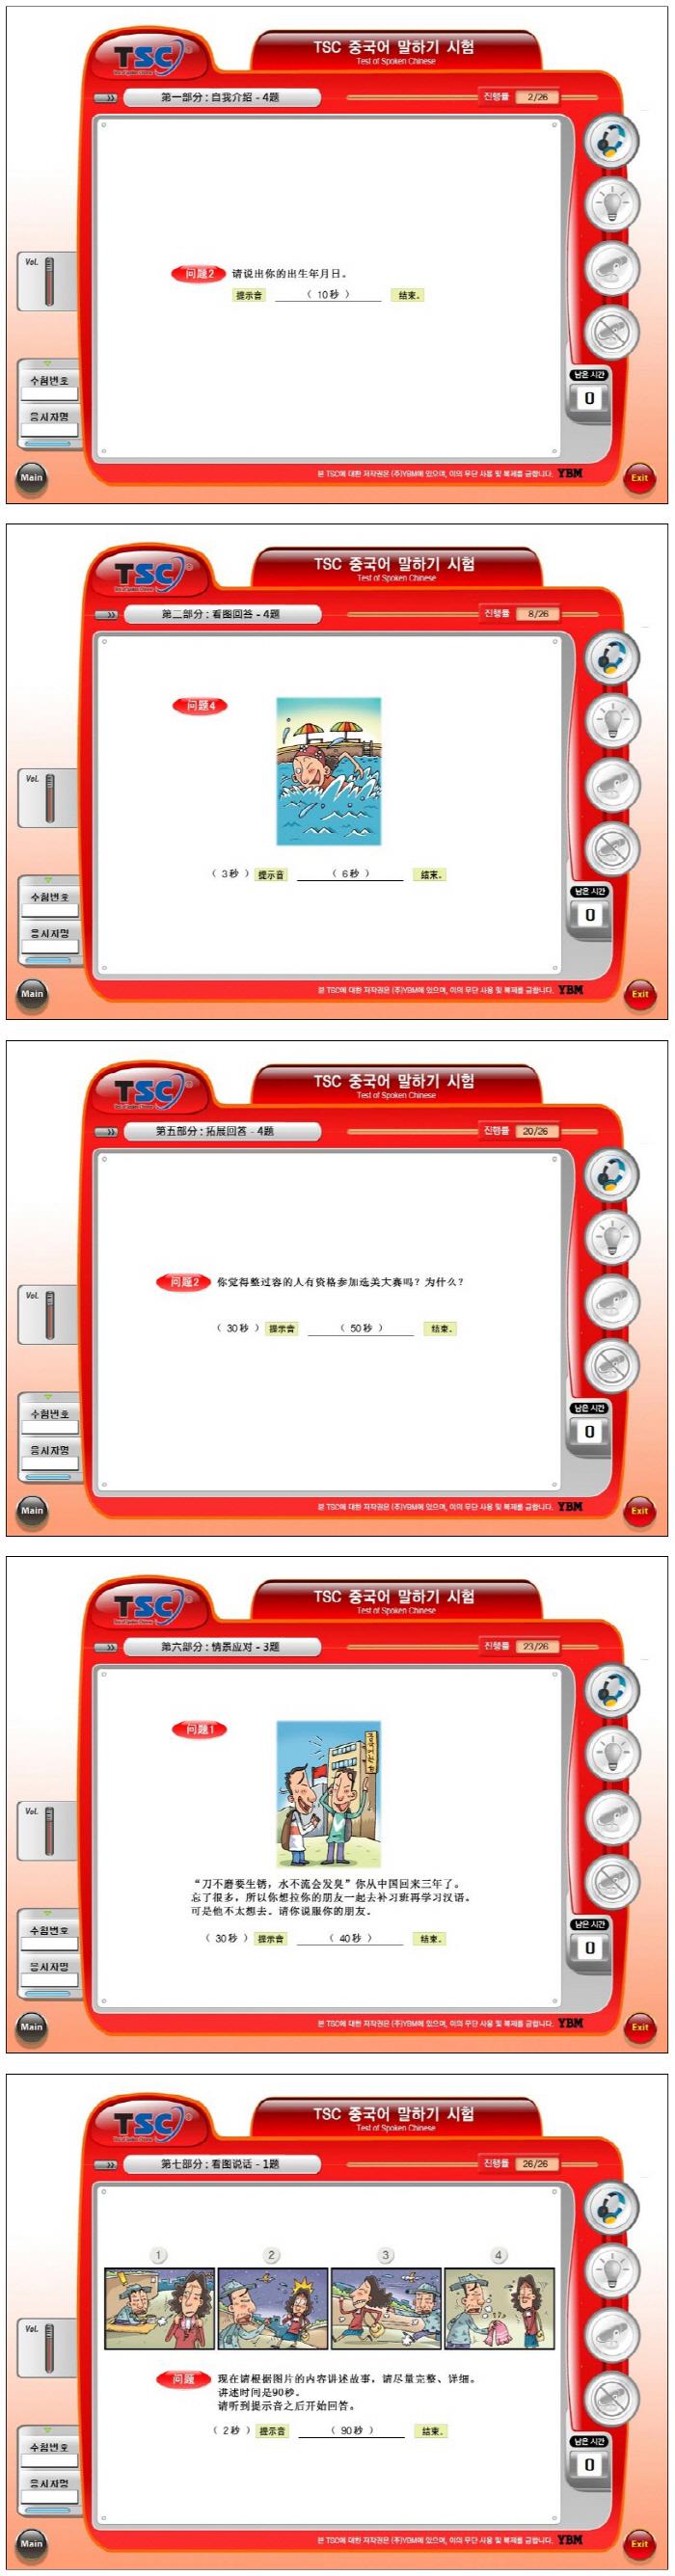 TSC 실전테스트(중국어 말하기 시험)(개정판)(CD1장포함)(전2권) 도서 상세이미지